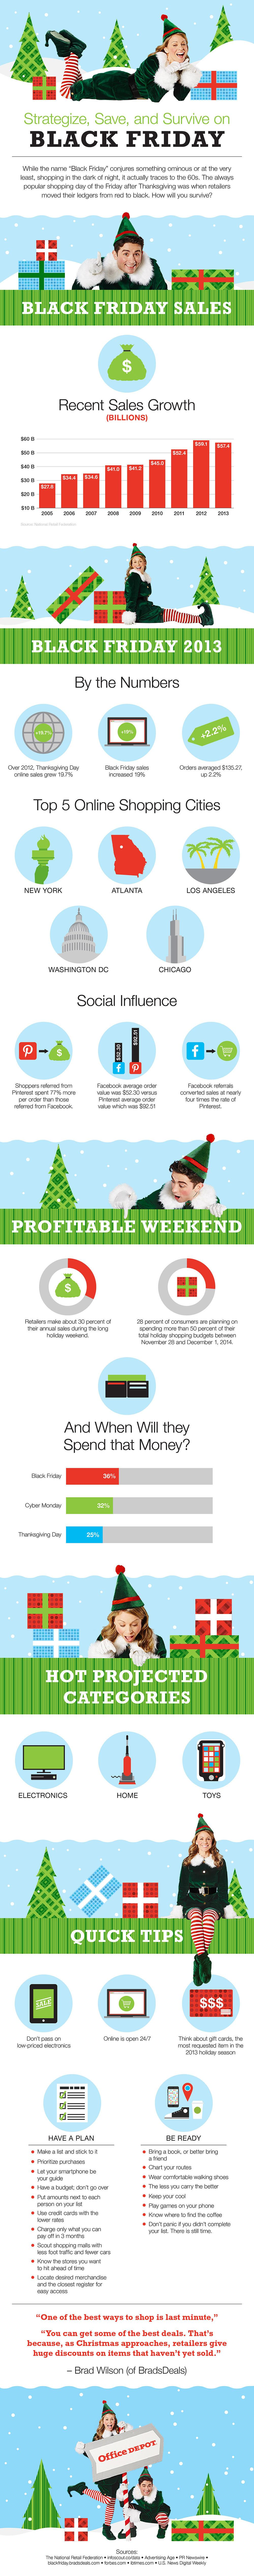 OfficeDepot- Black Friday Strategy